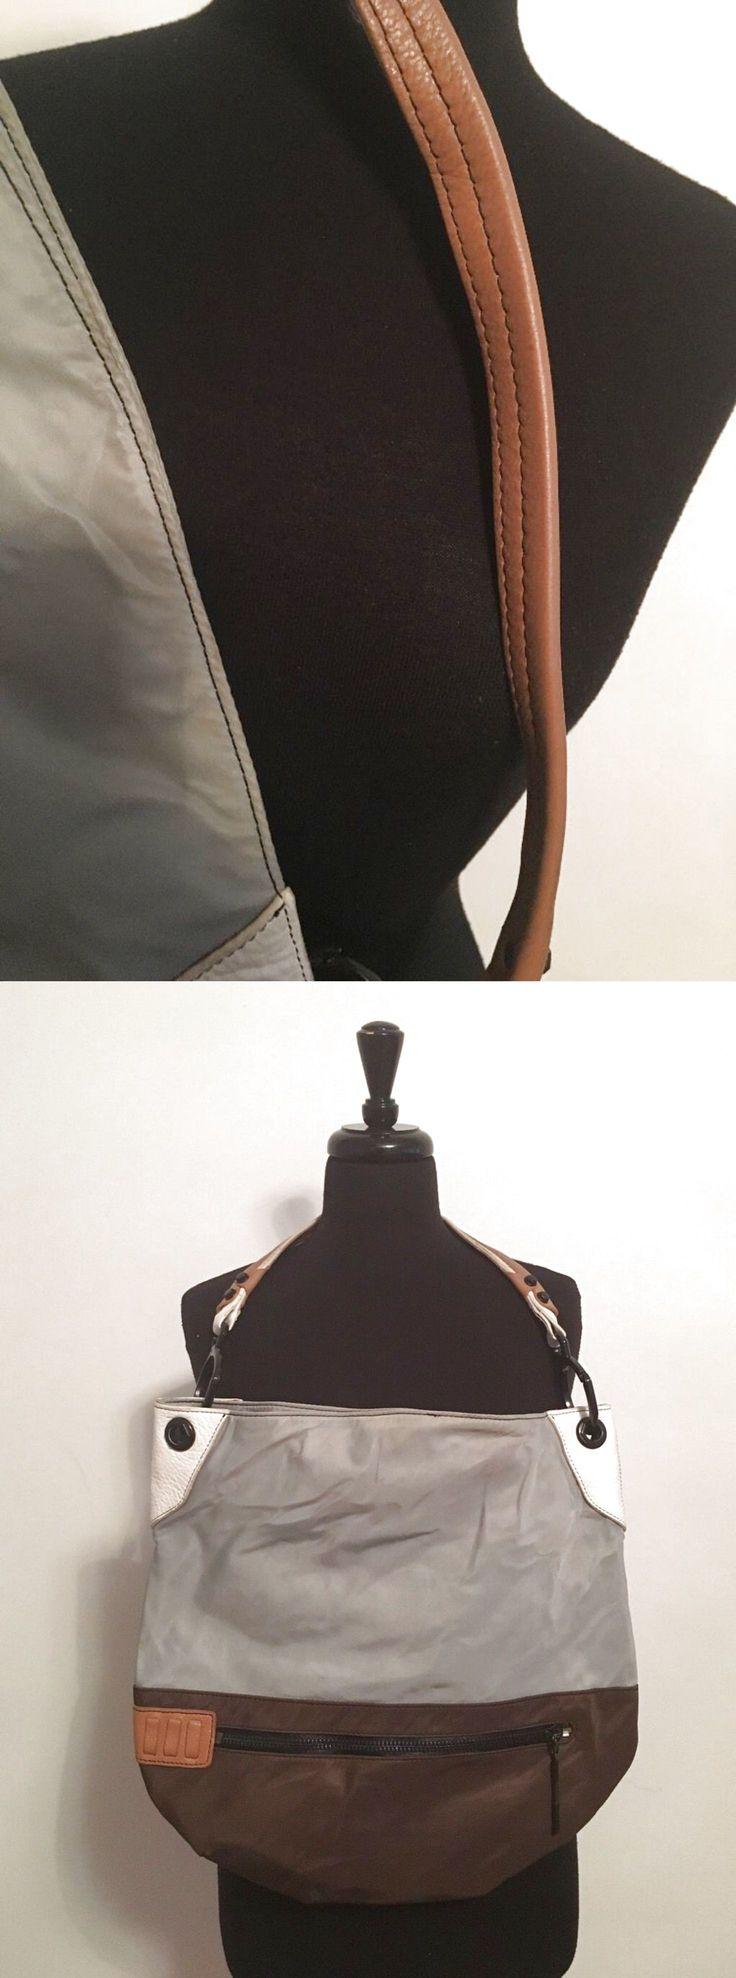 Oryany Nylon And Leather Hobo Bag $29.0